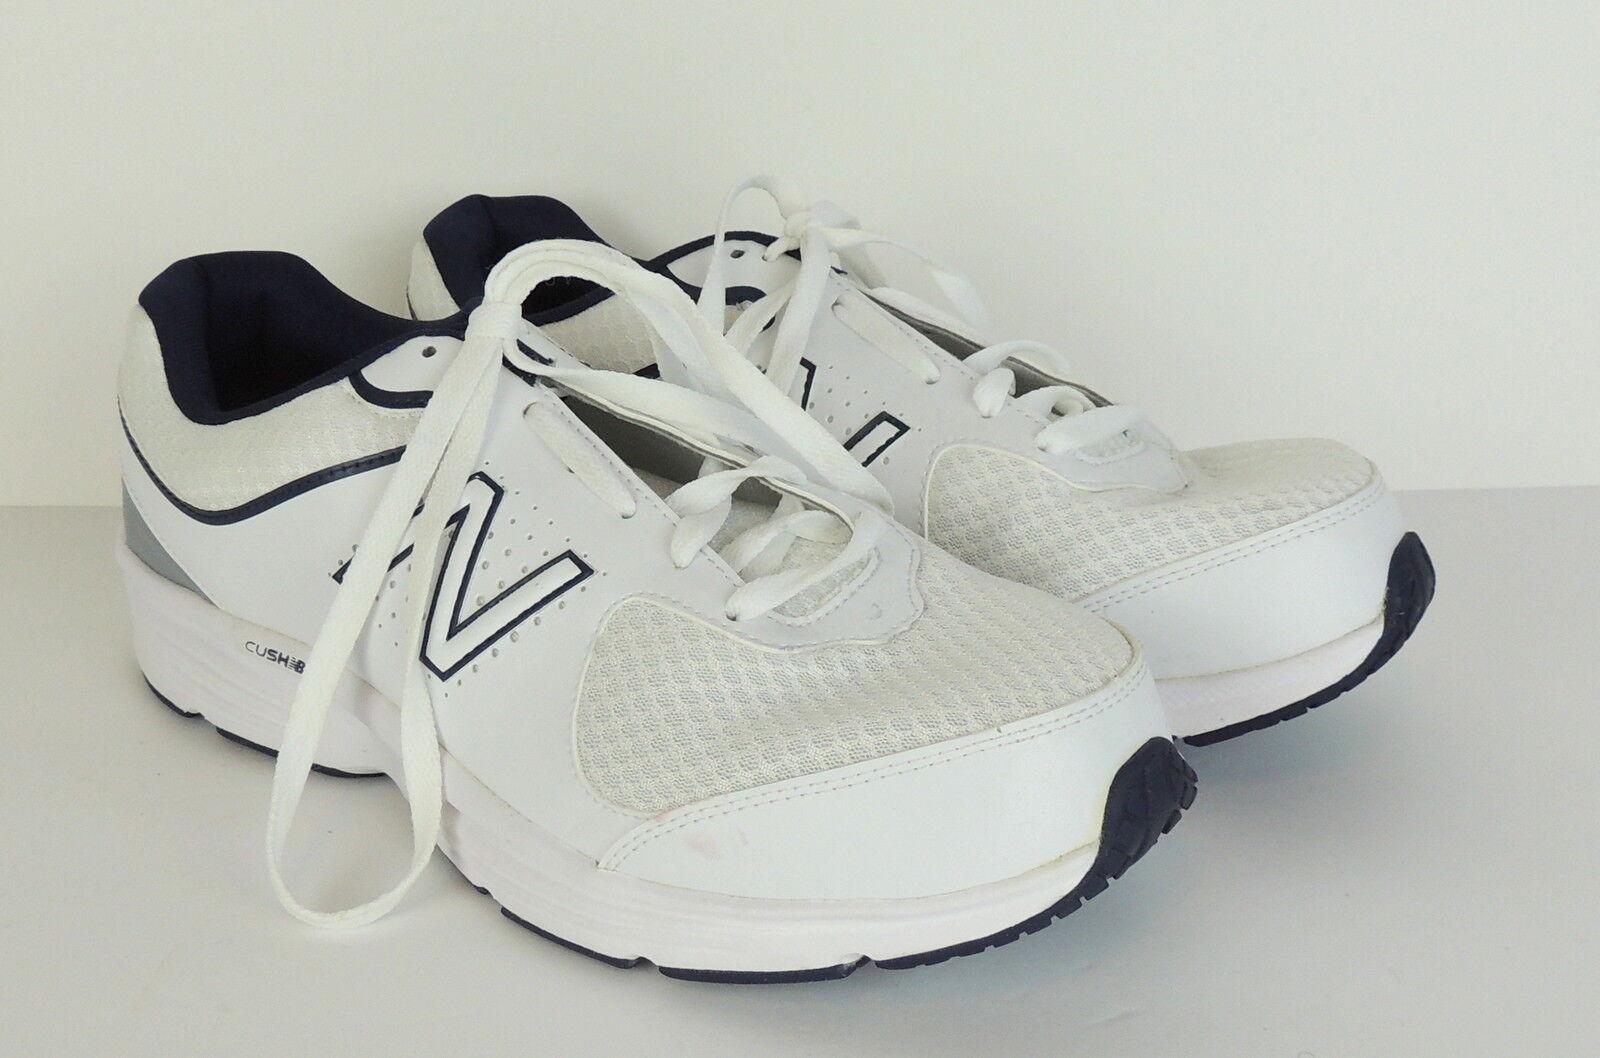 New Balance Homme 11EEEE Sneakers 11 4E WIDE Blanc Cushioning Comfort Insert